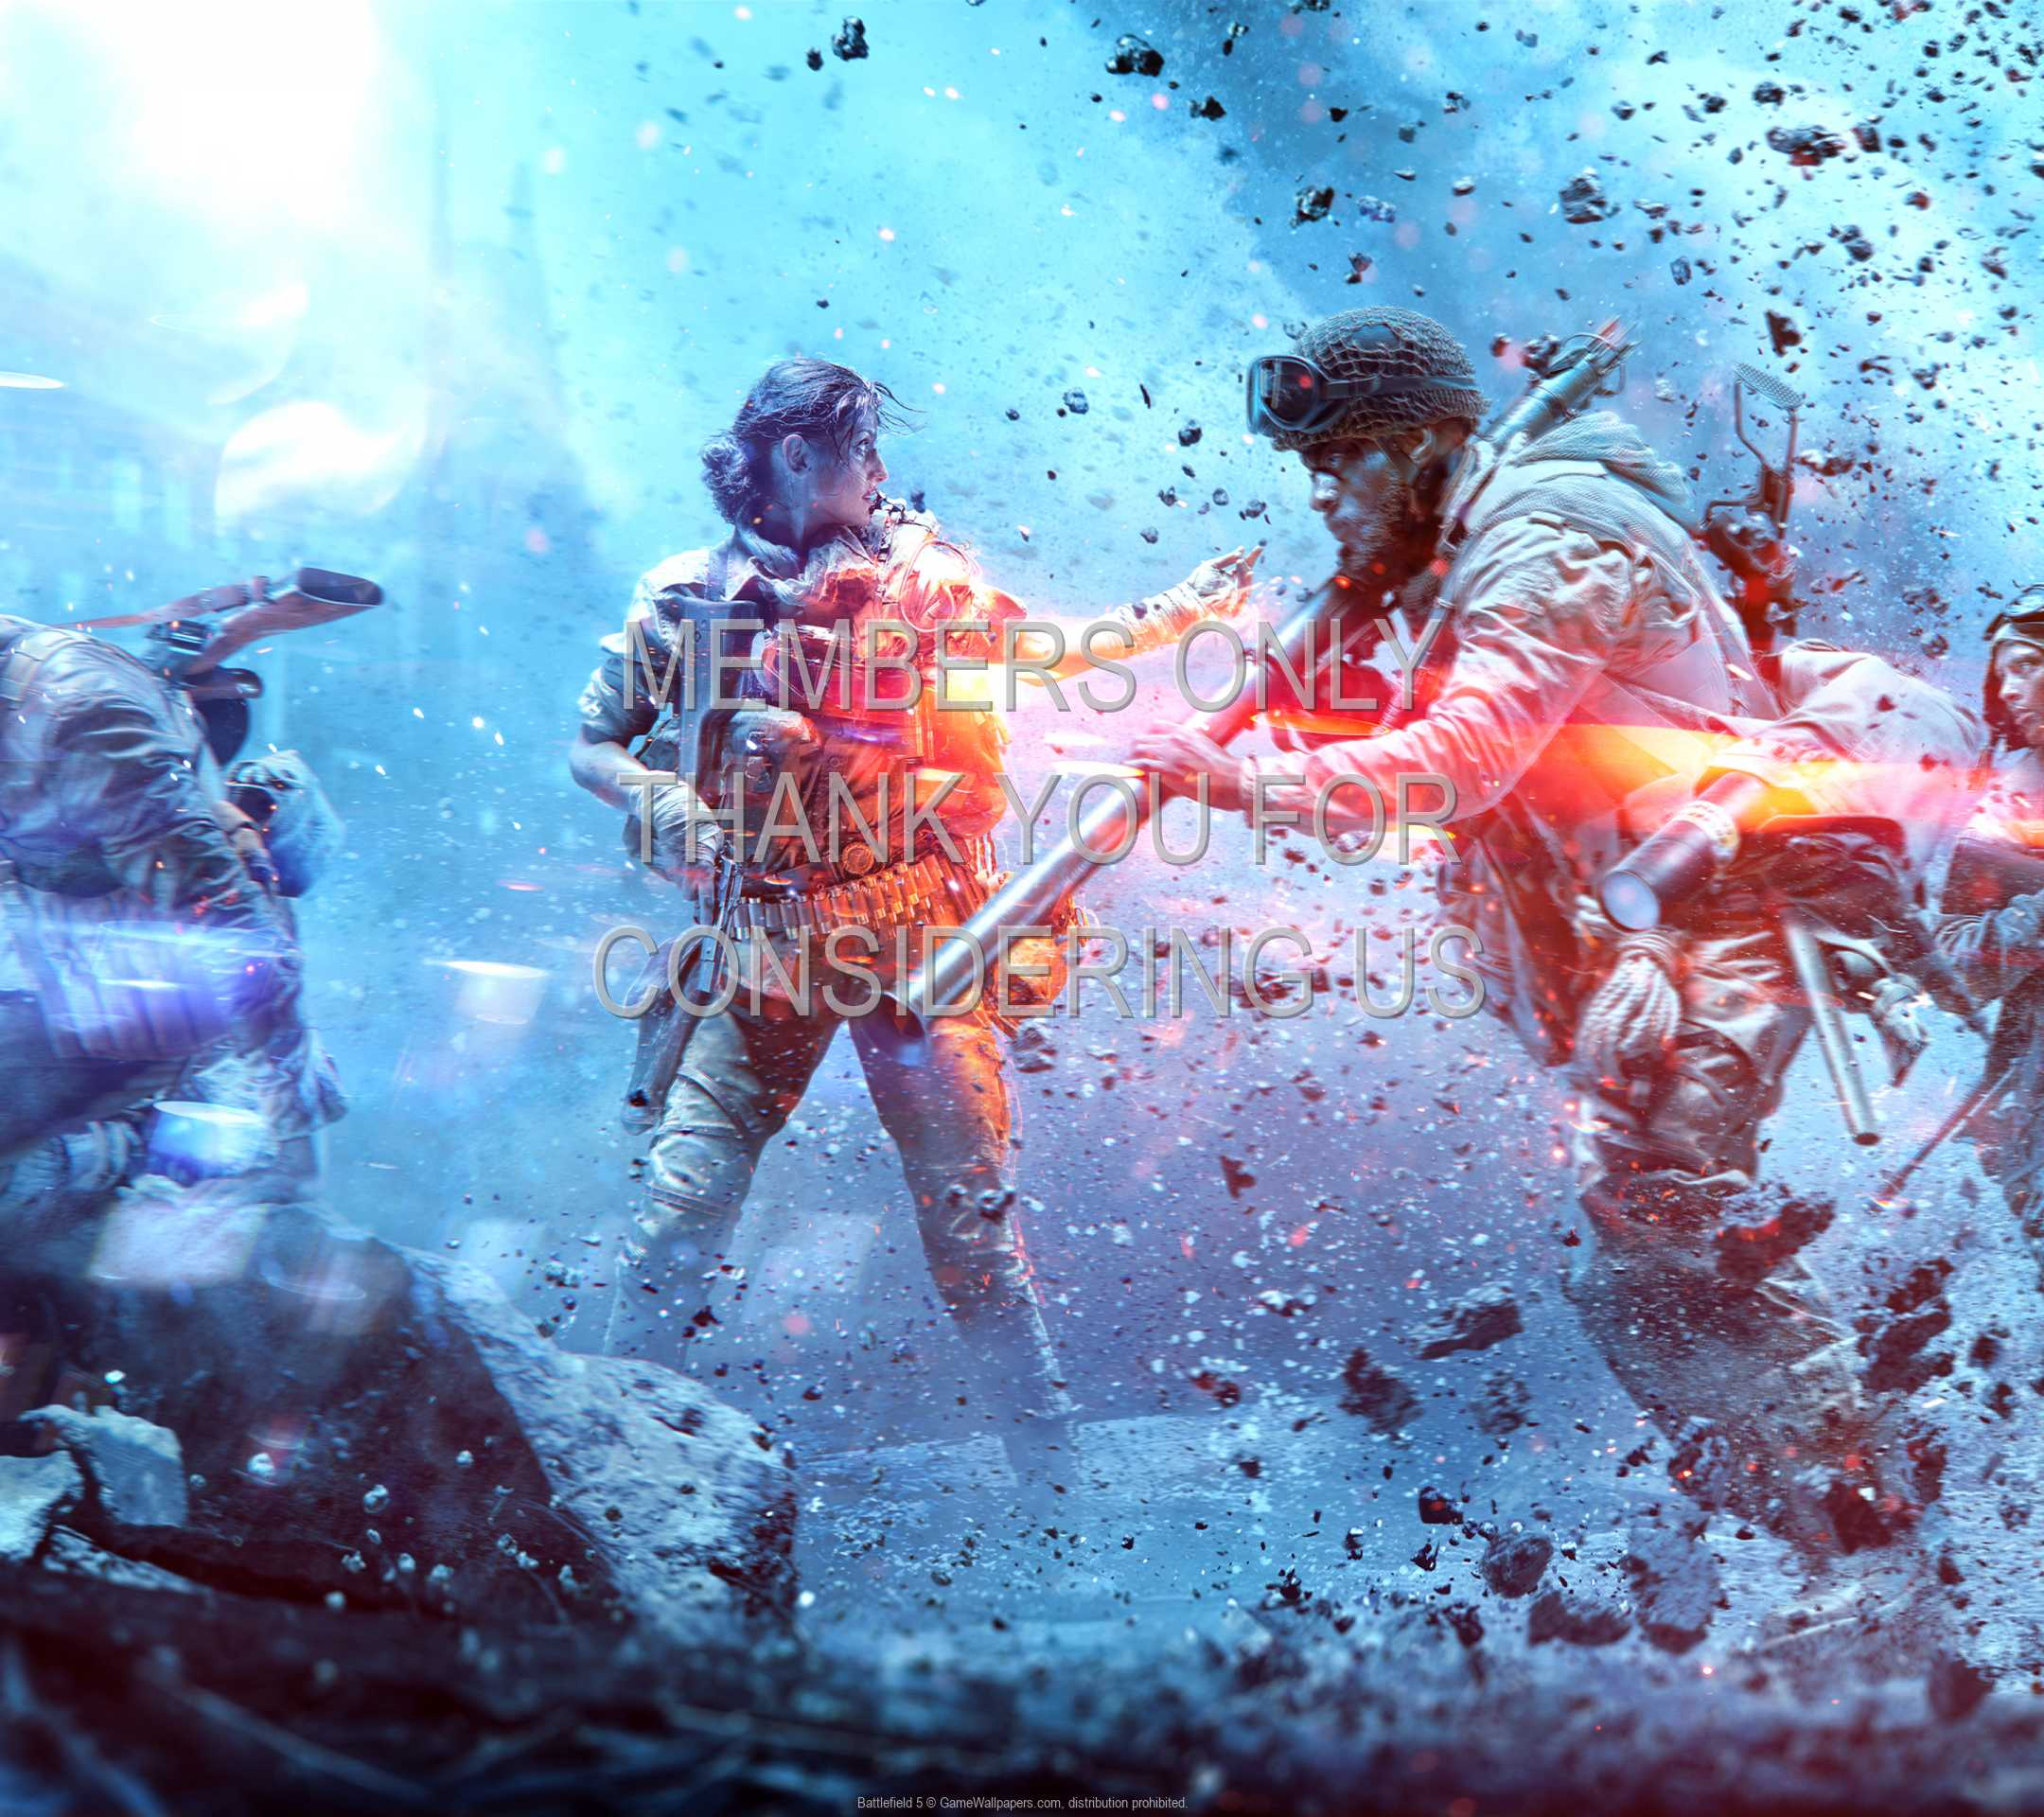 Battlefield 5 1080p Horizontal Mobile wallpaper or background 04